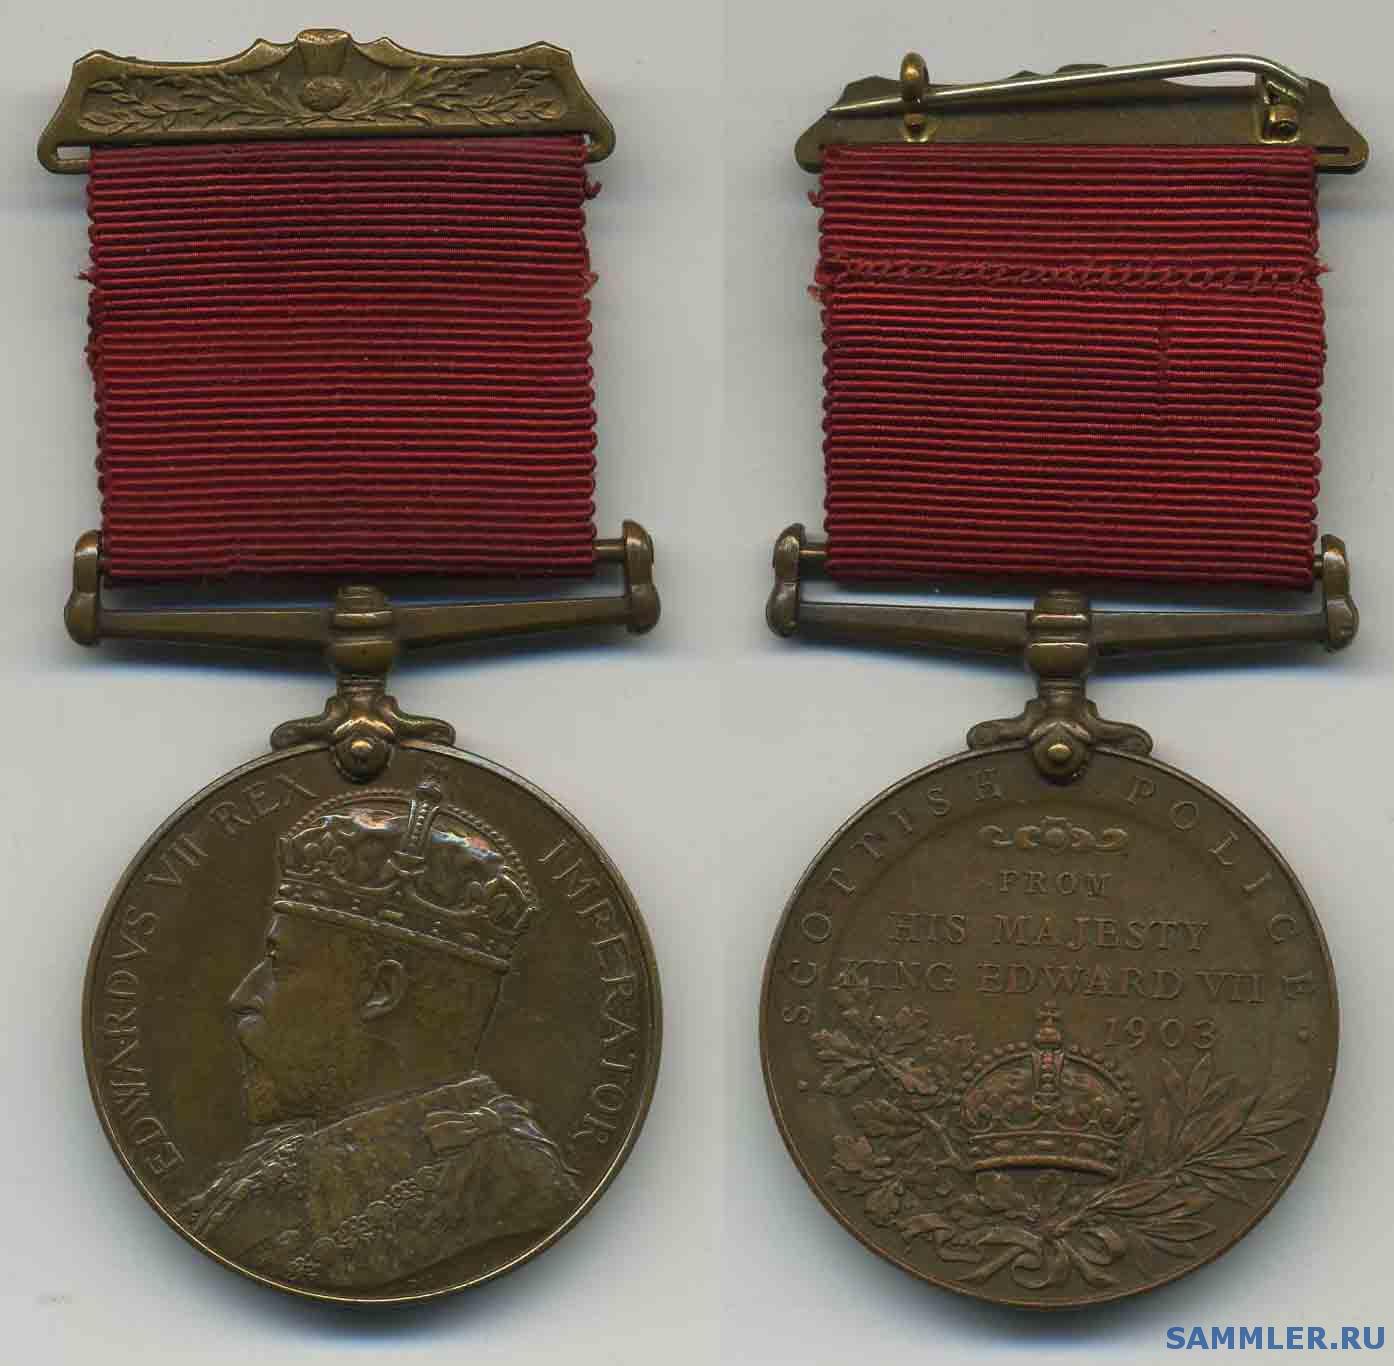 Visit_to_Scotland_Medal_1903.jpg